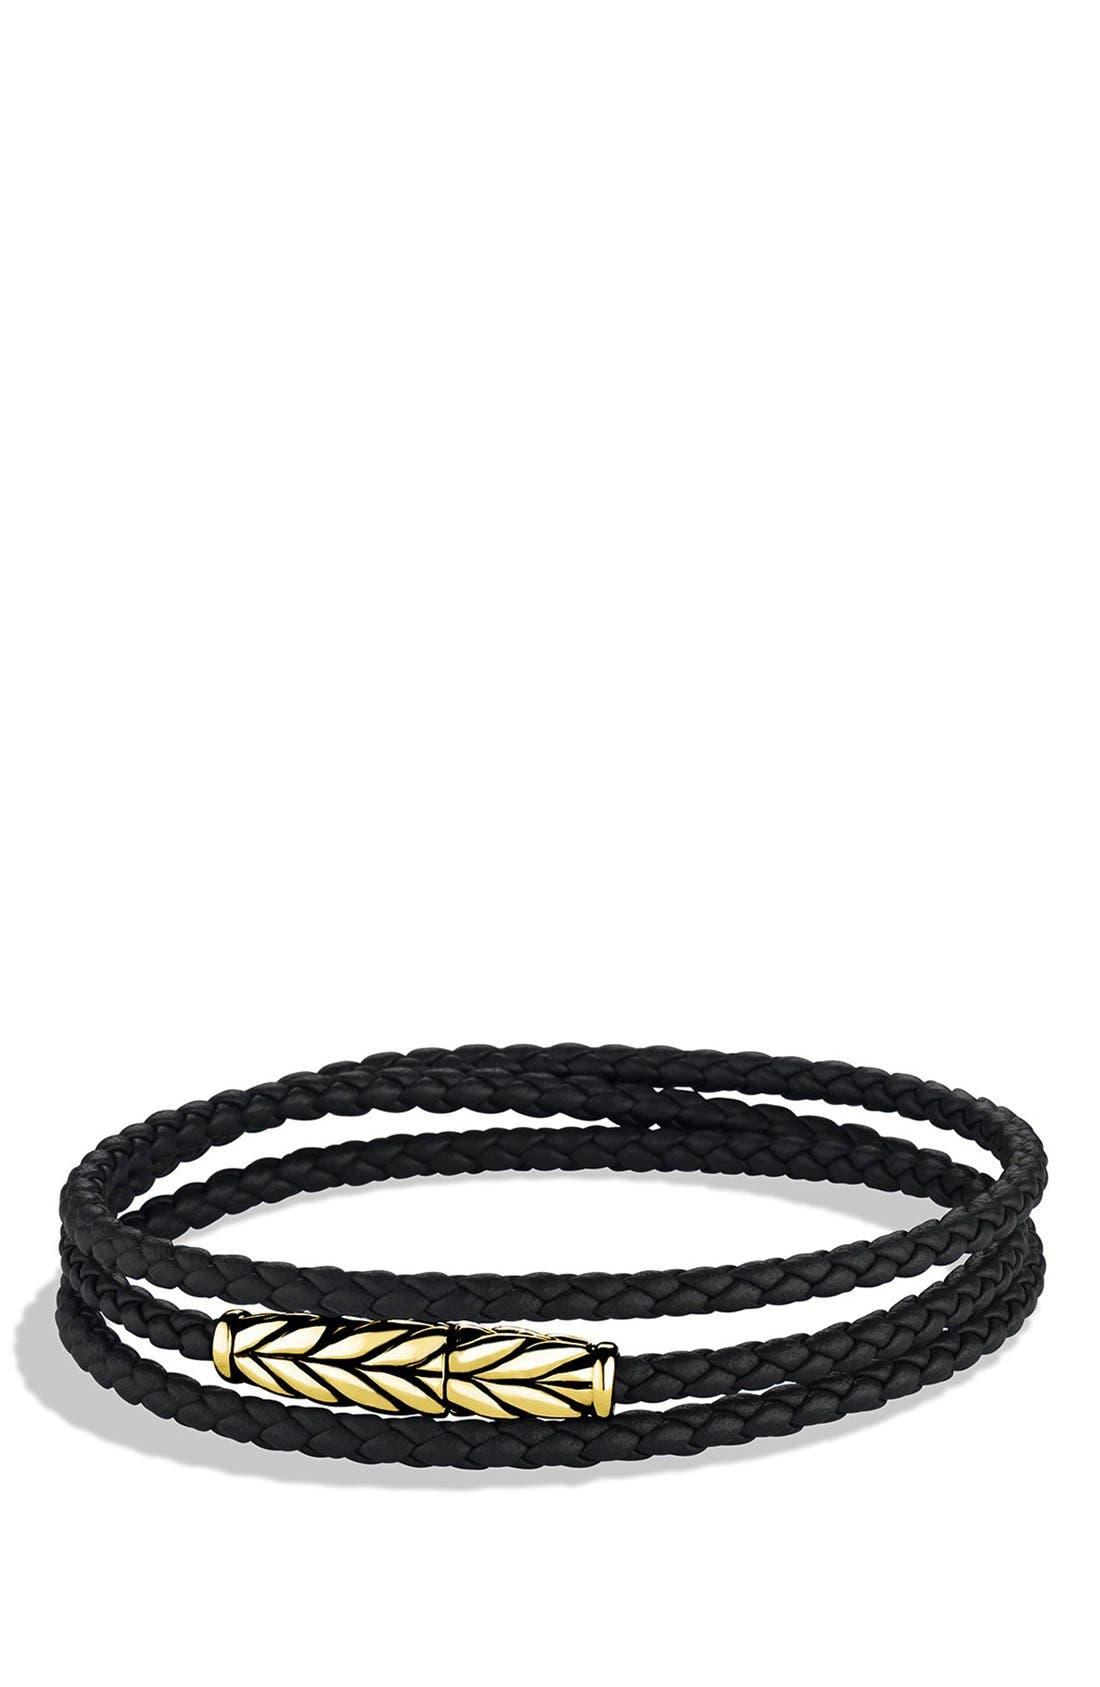 DAVID YURMAN 'Chevron' Triple-Wrap Bracelet in Black Leather